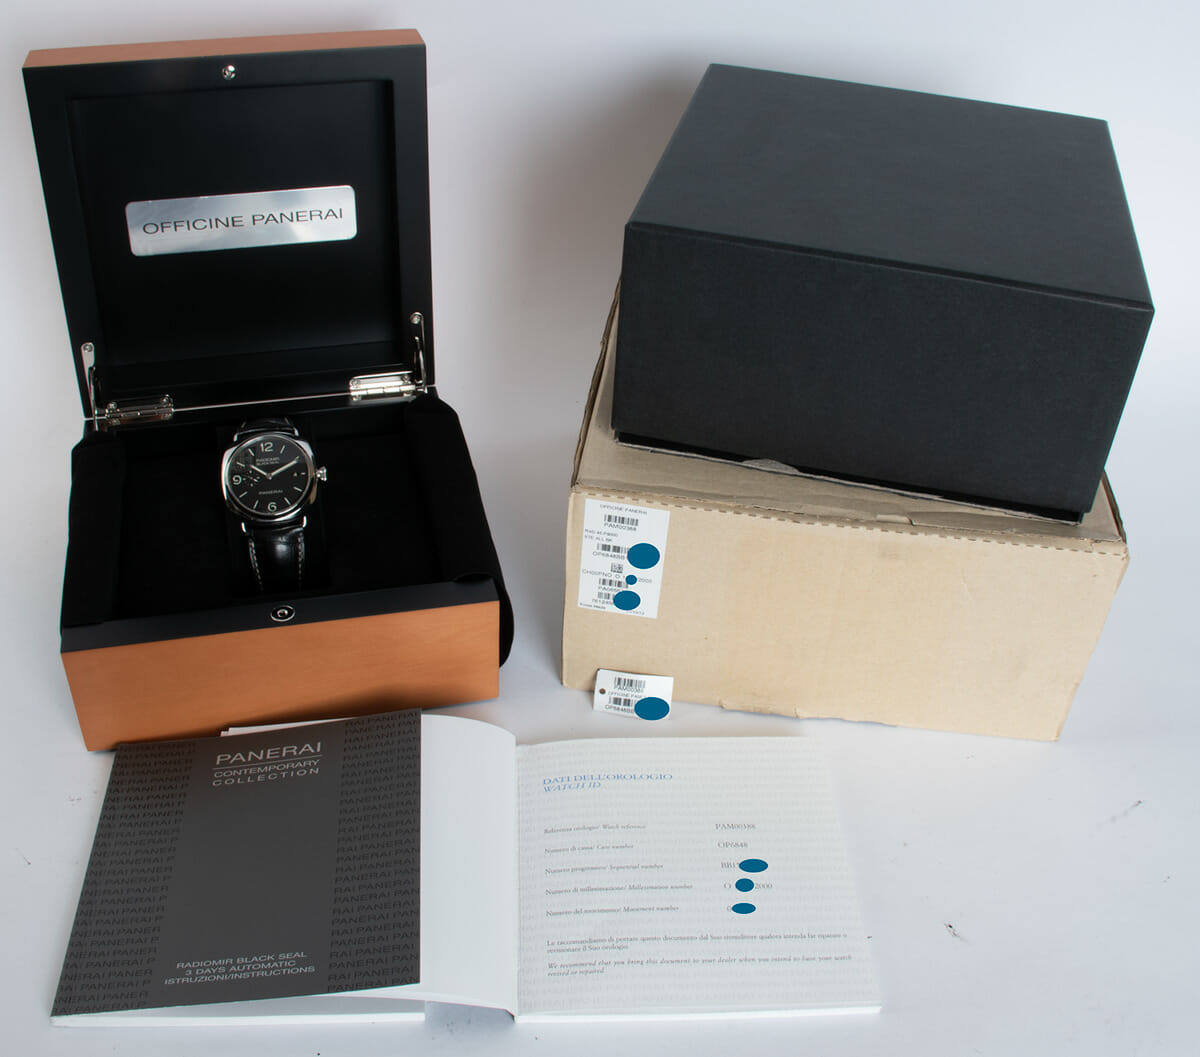 Box / Paper shot of Radiomir Black Seal 3 Days